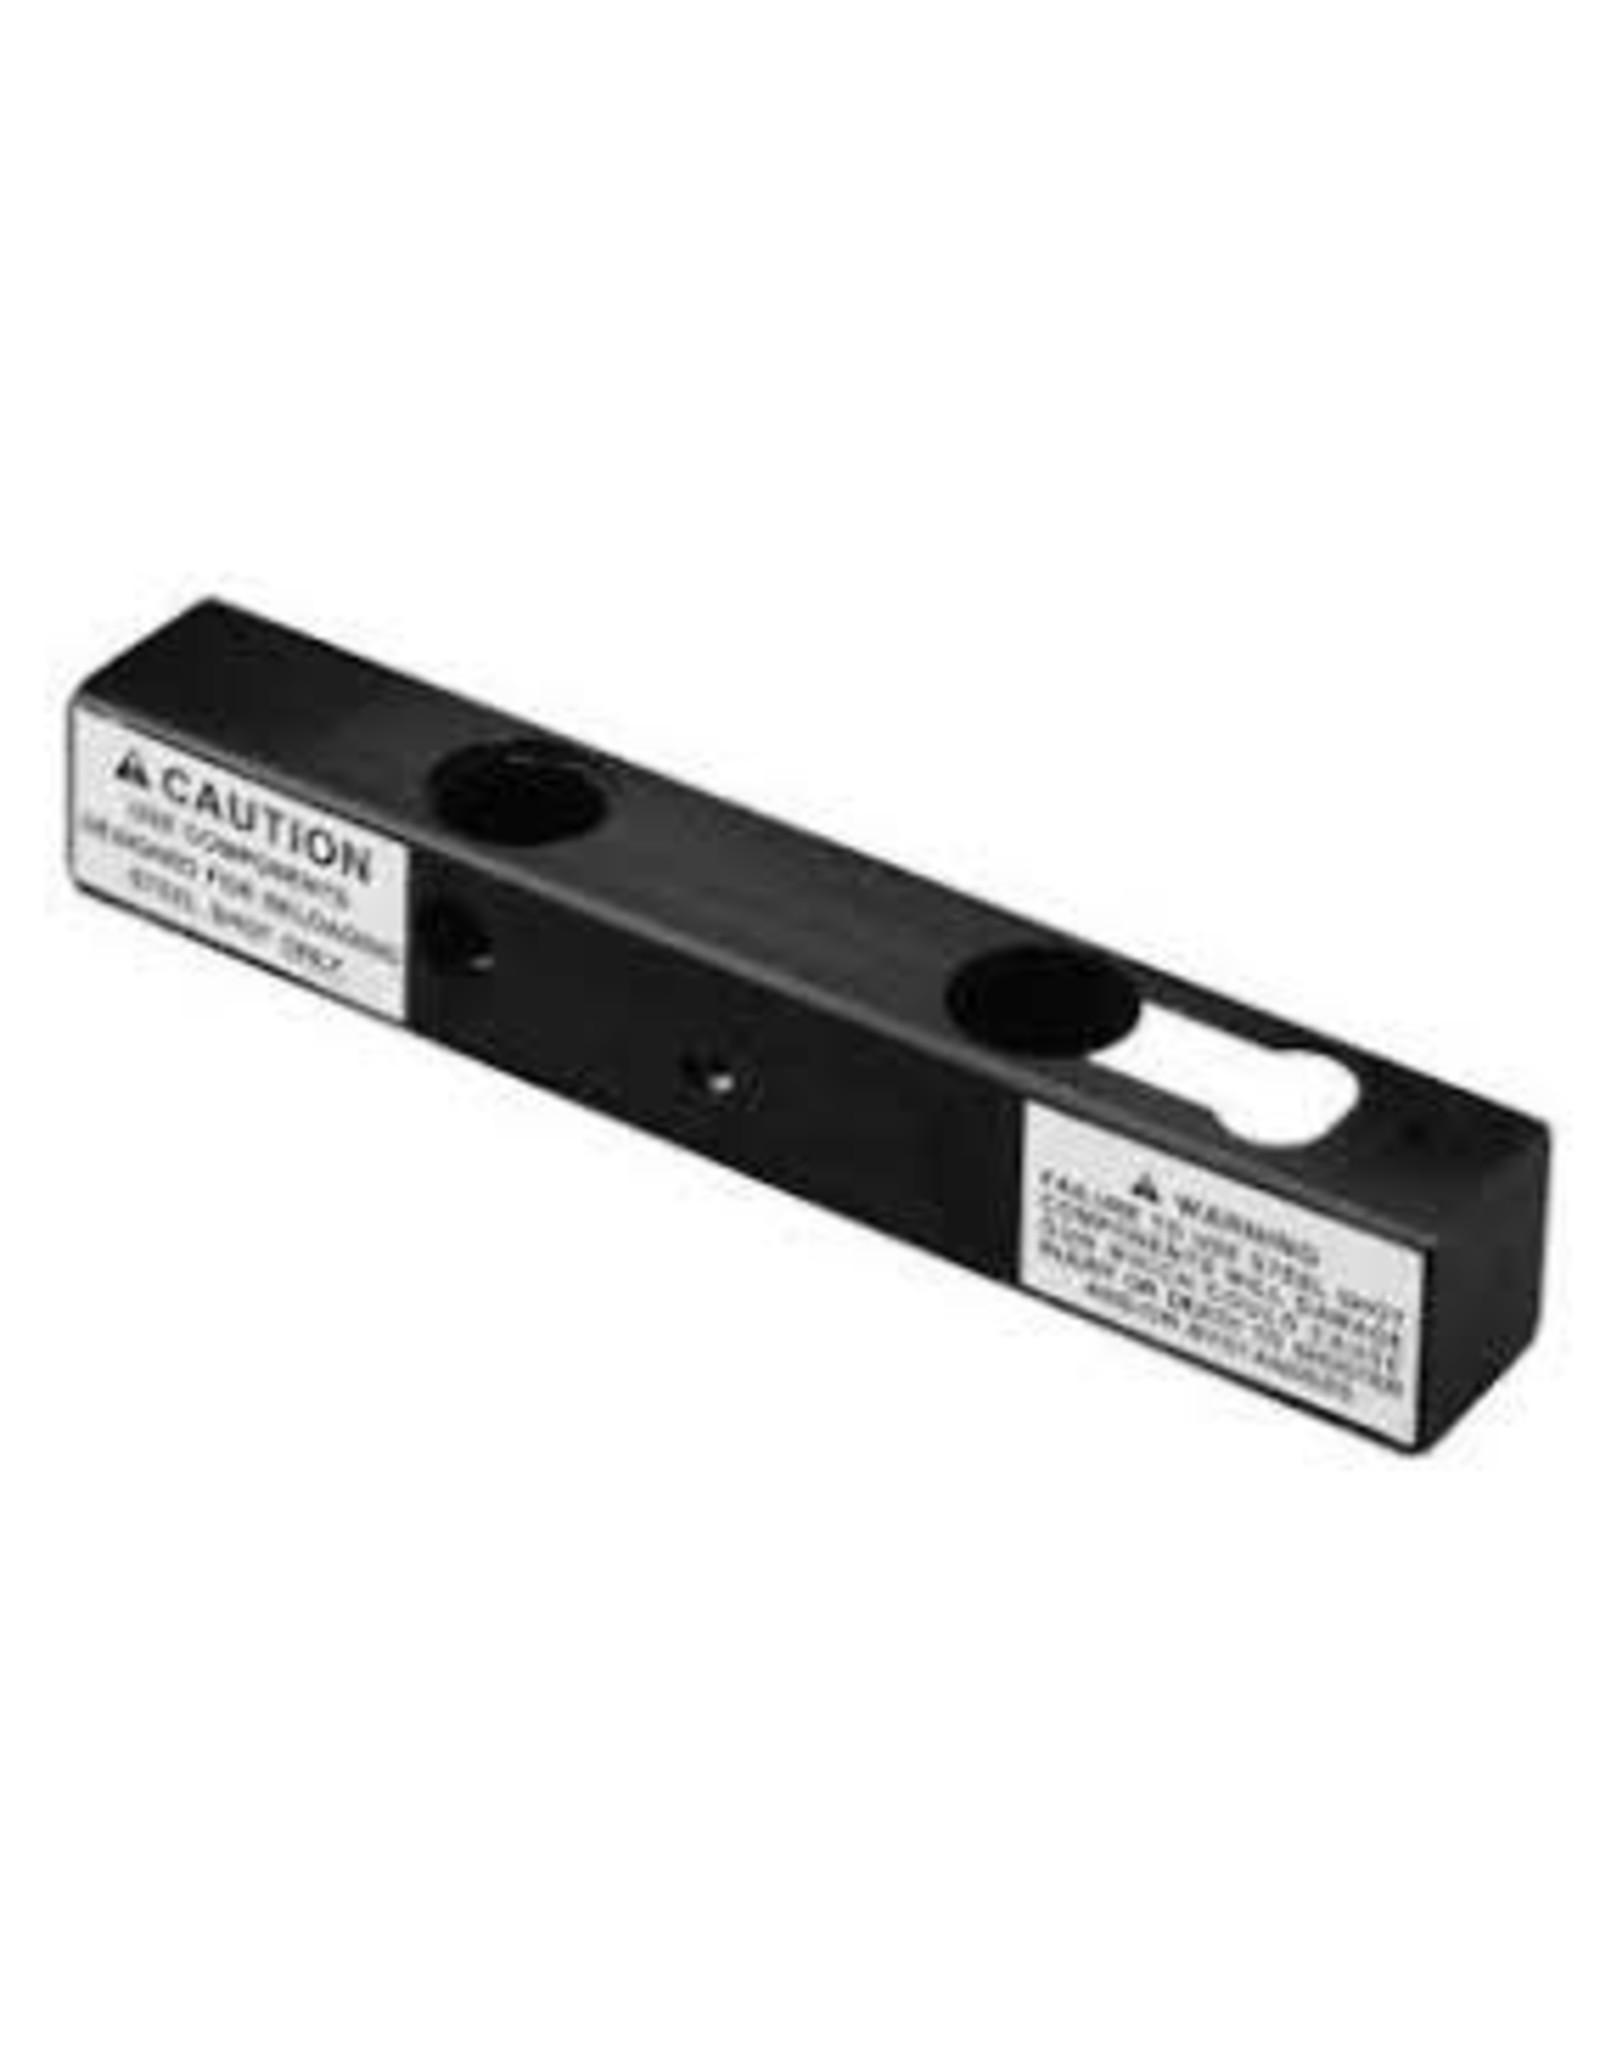 MEC MEC Steel Shot 302 Charge Bar 1 1/2 OZ #3 - #6